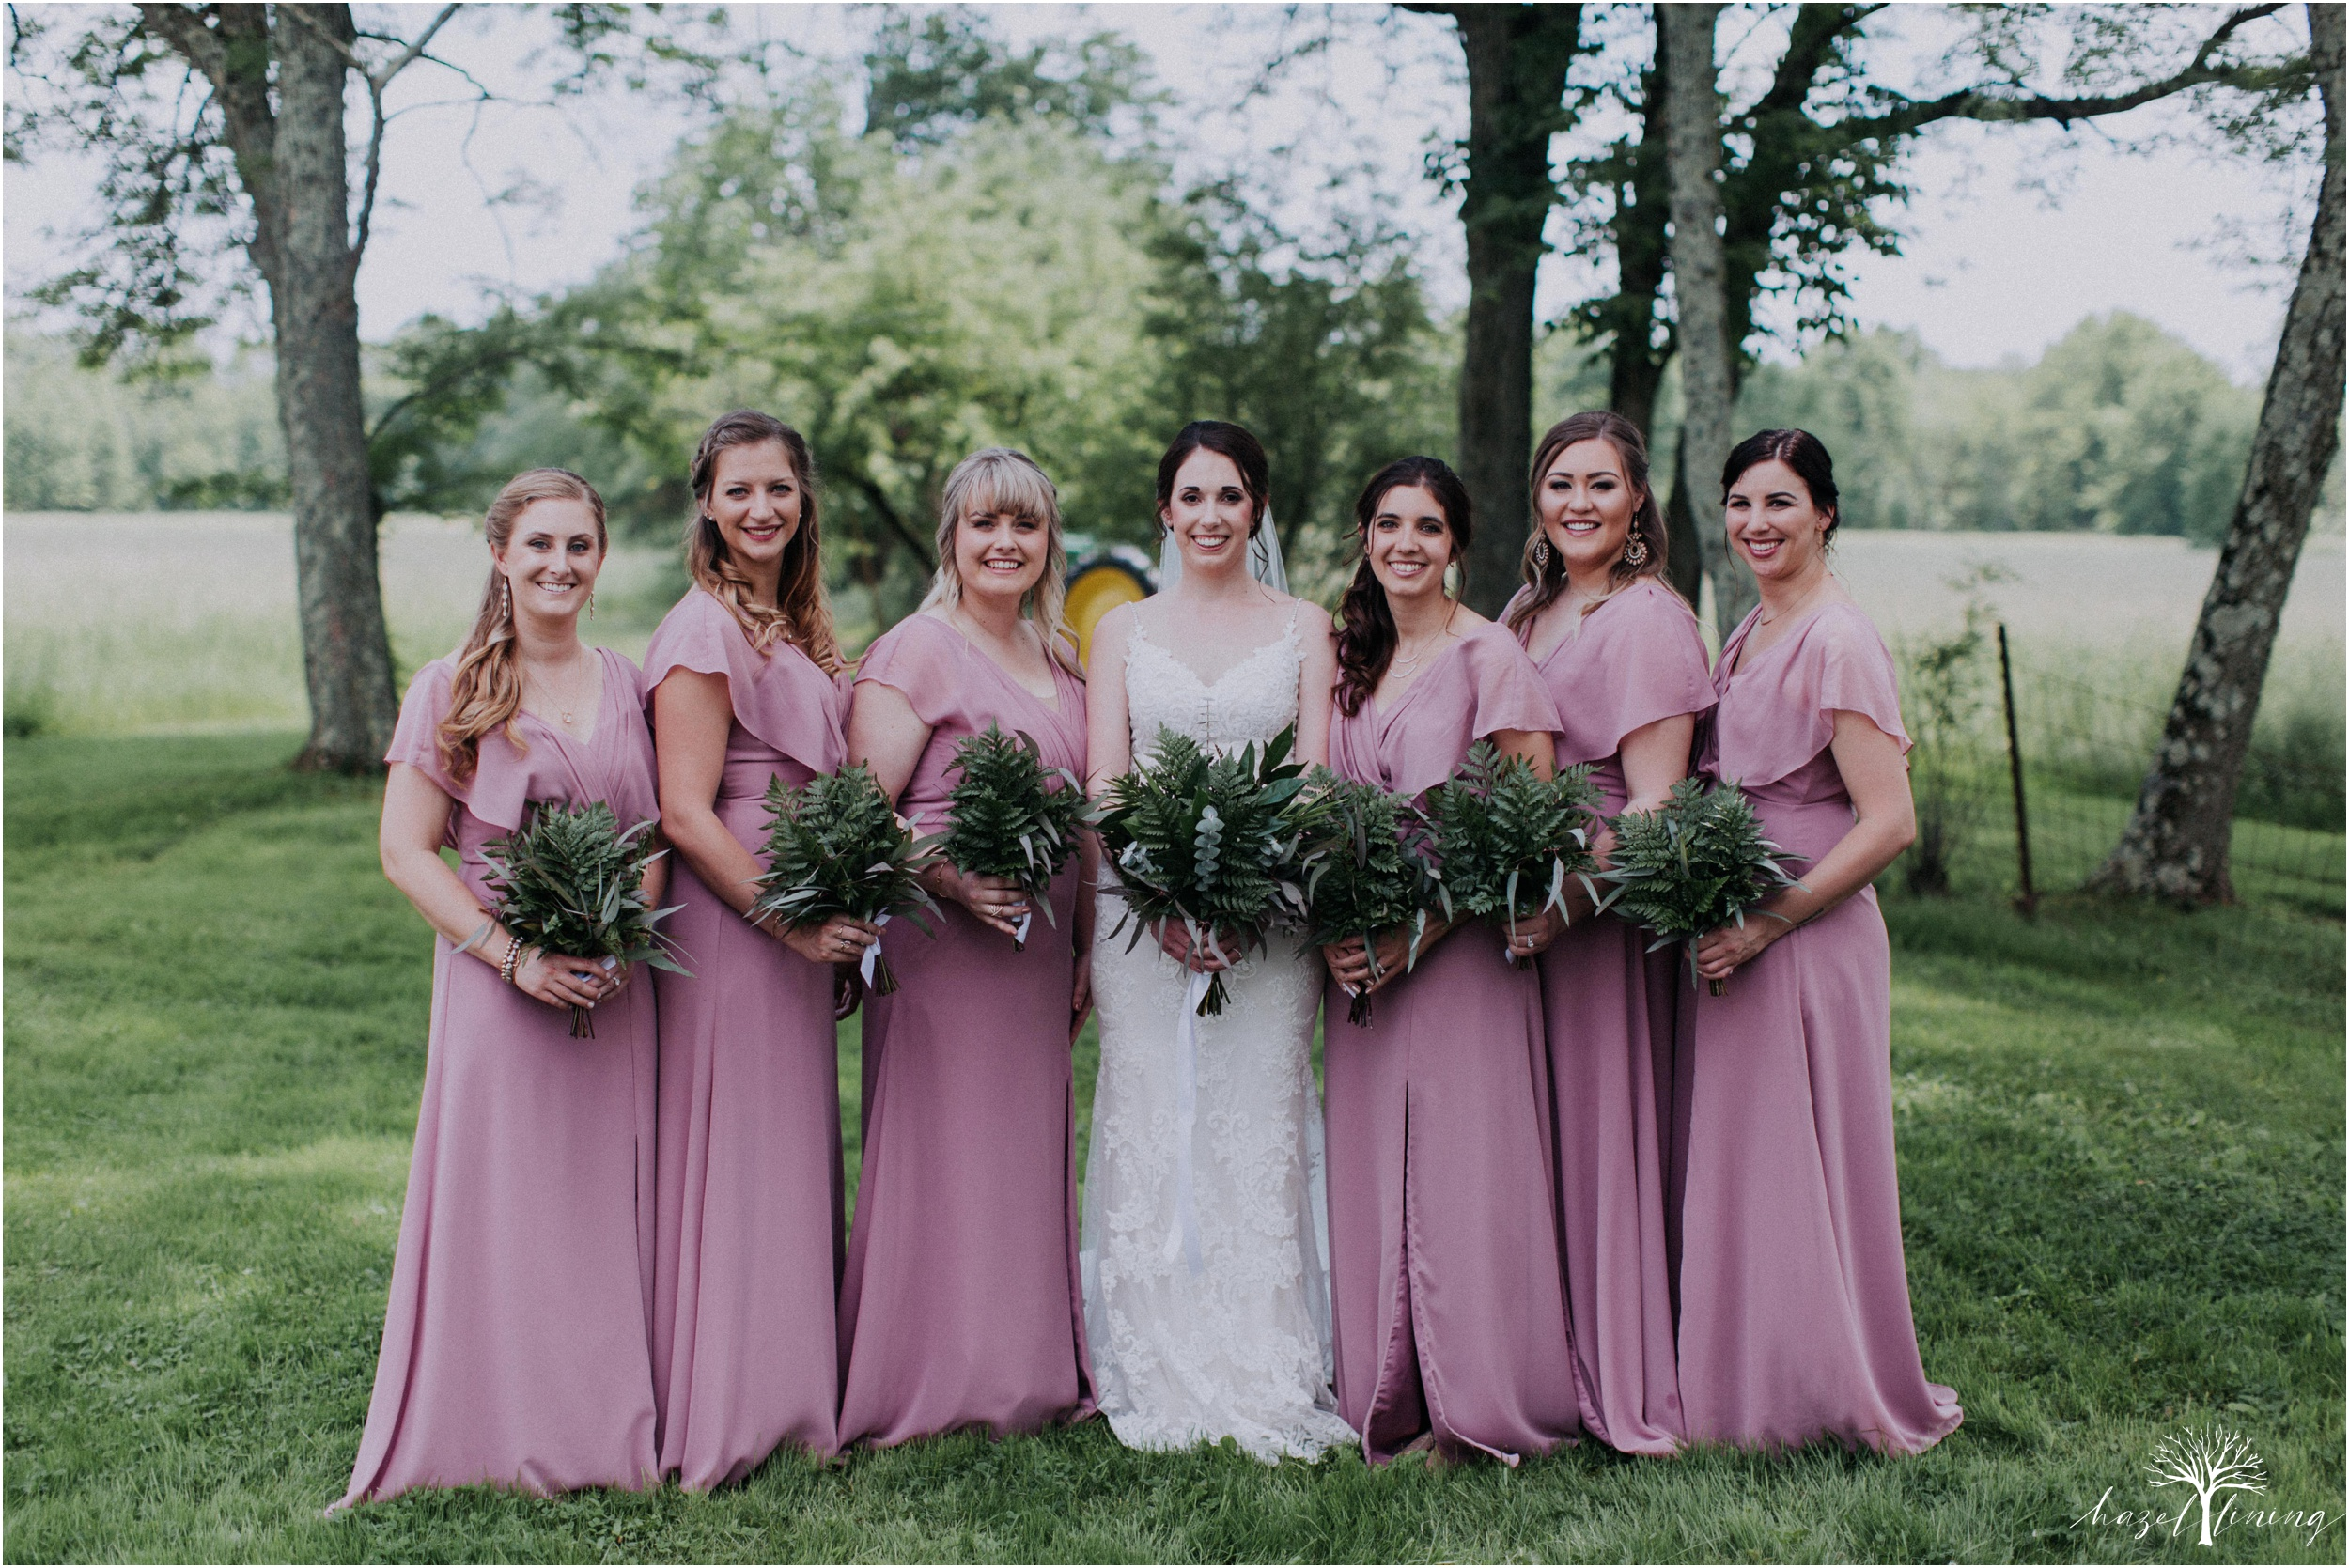 hazel-lining-travel-wedding-elopement-photography-lisa-landon-shoemaker-the-farm-bakery-and-events-bucks-county-quakertown-pennsylvania-summer-country-outdoor-farm-wedding_0024.jpg